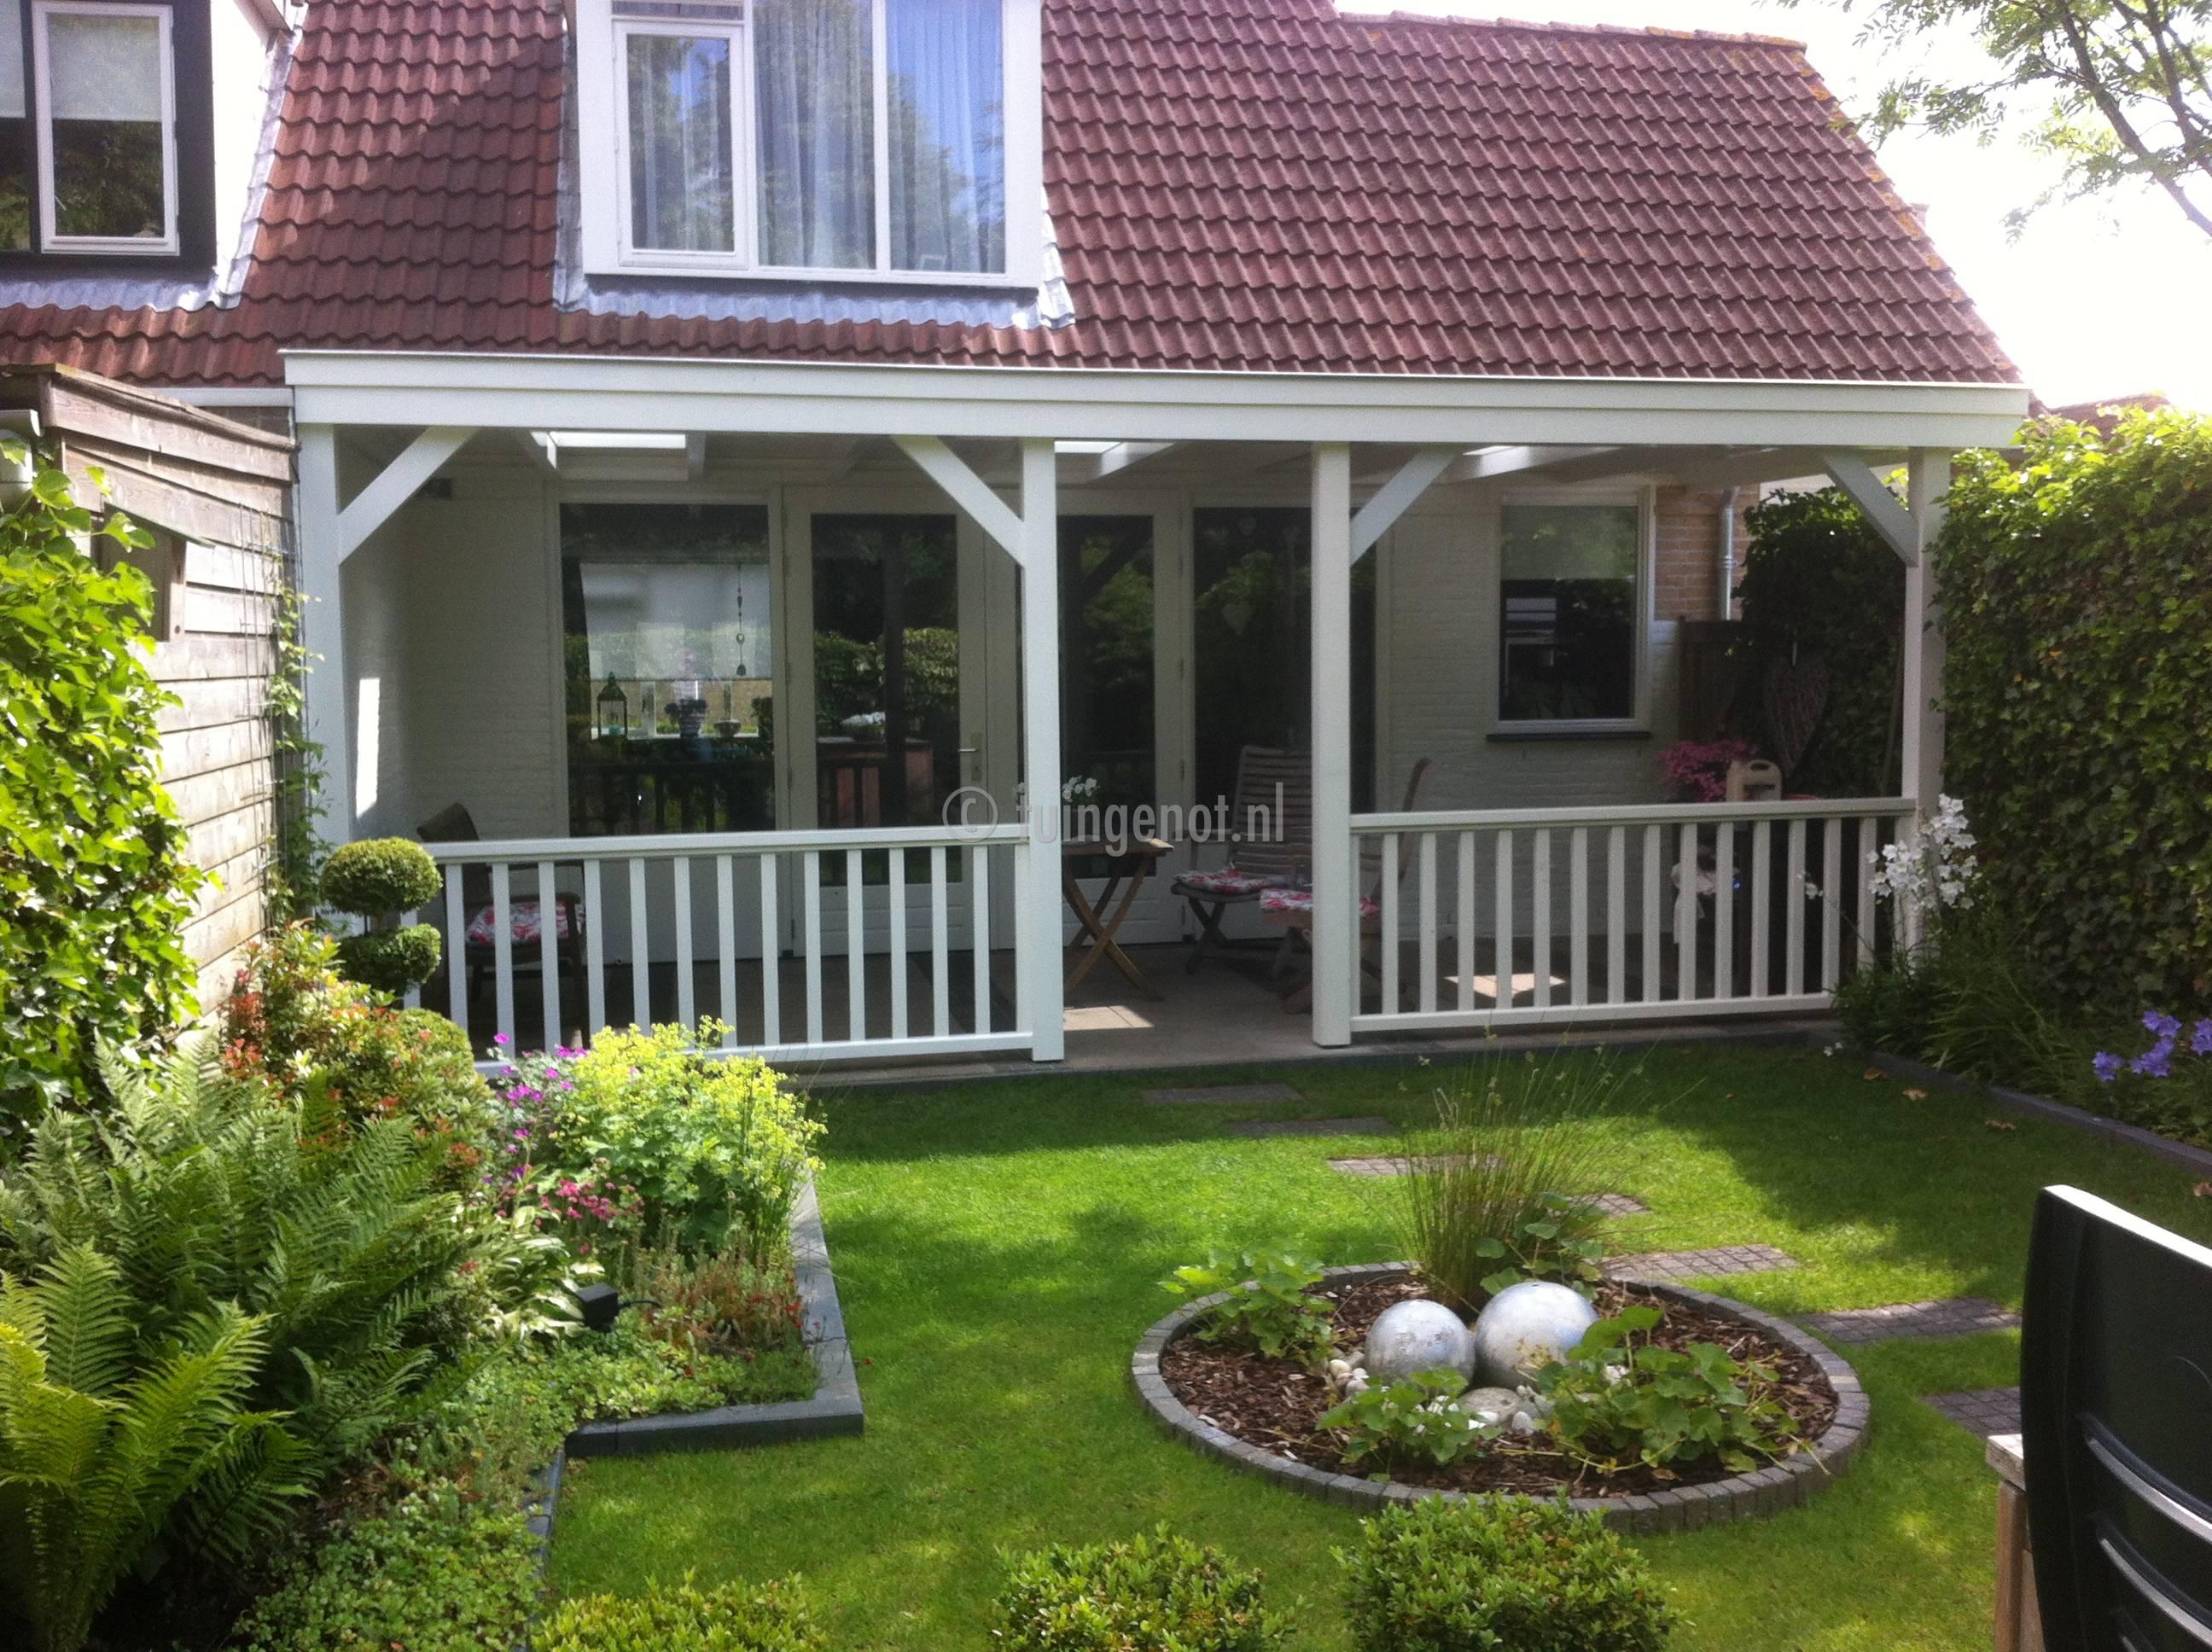 Tuingenot veranda met hekwerk - Veranda ou uitbreiding ...